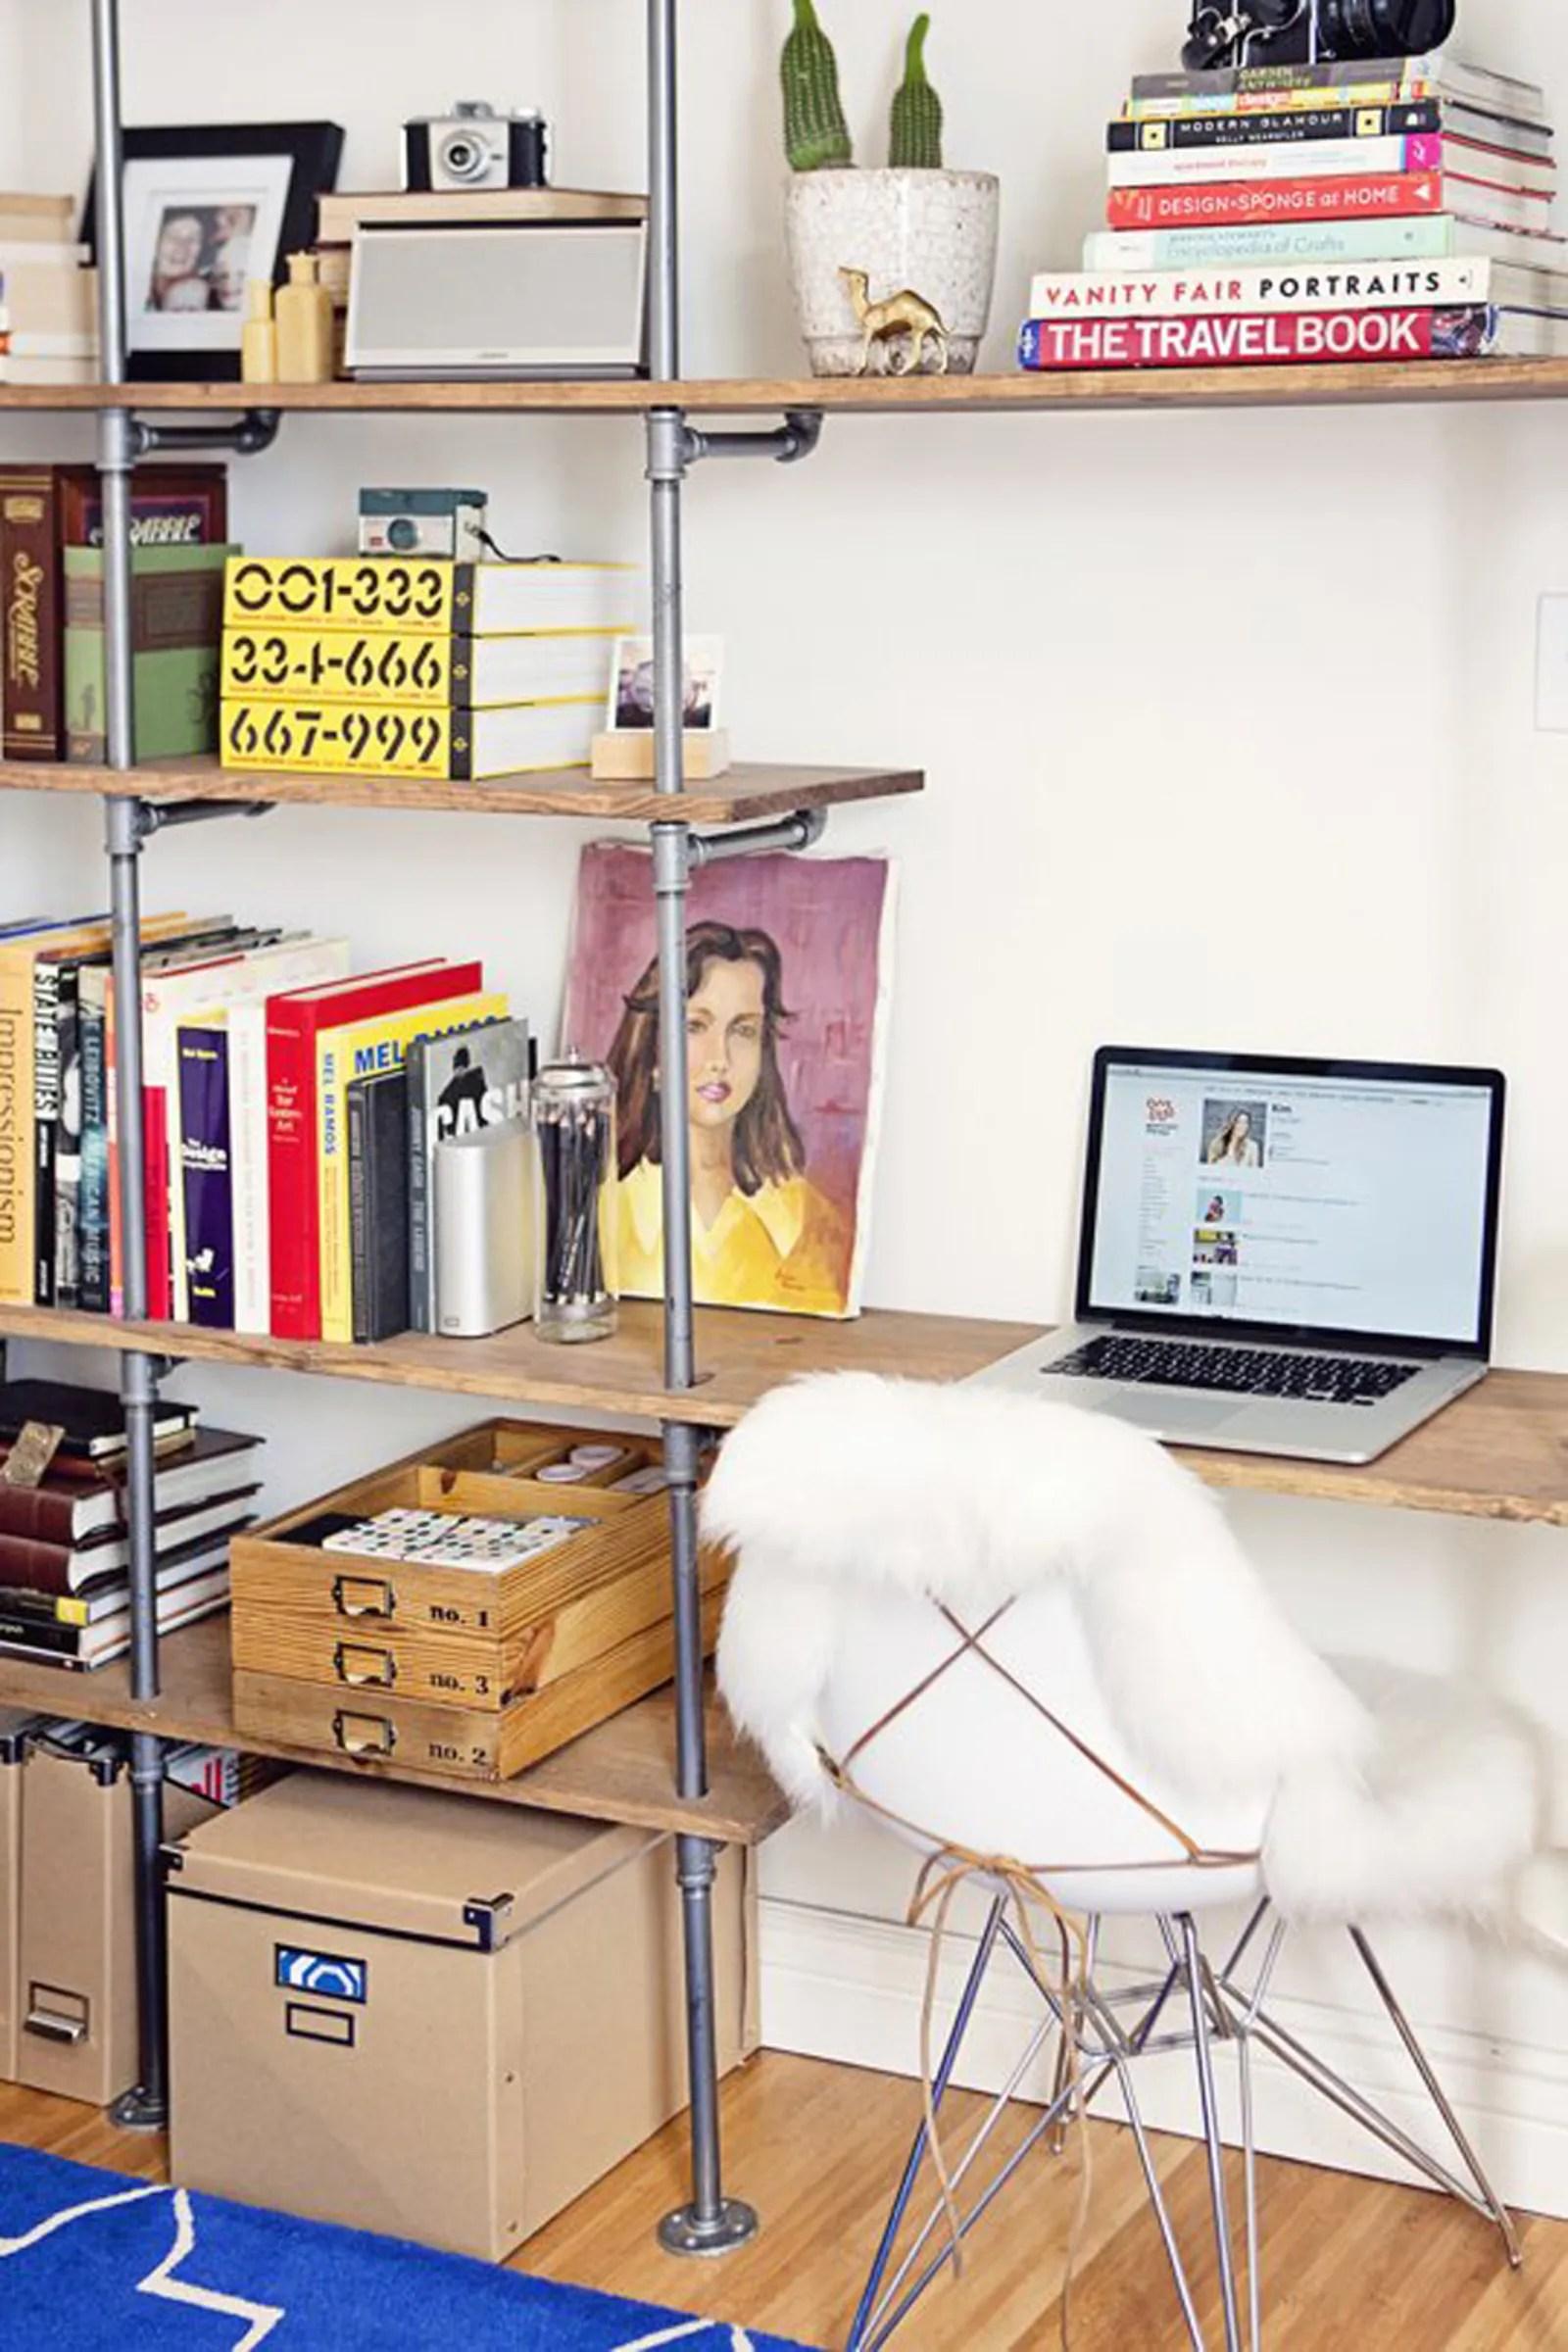 25 Creative Ways To Decorate Your Dorm Room DIY Budget